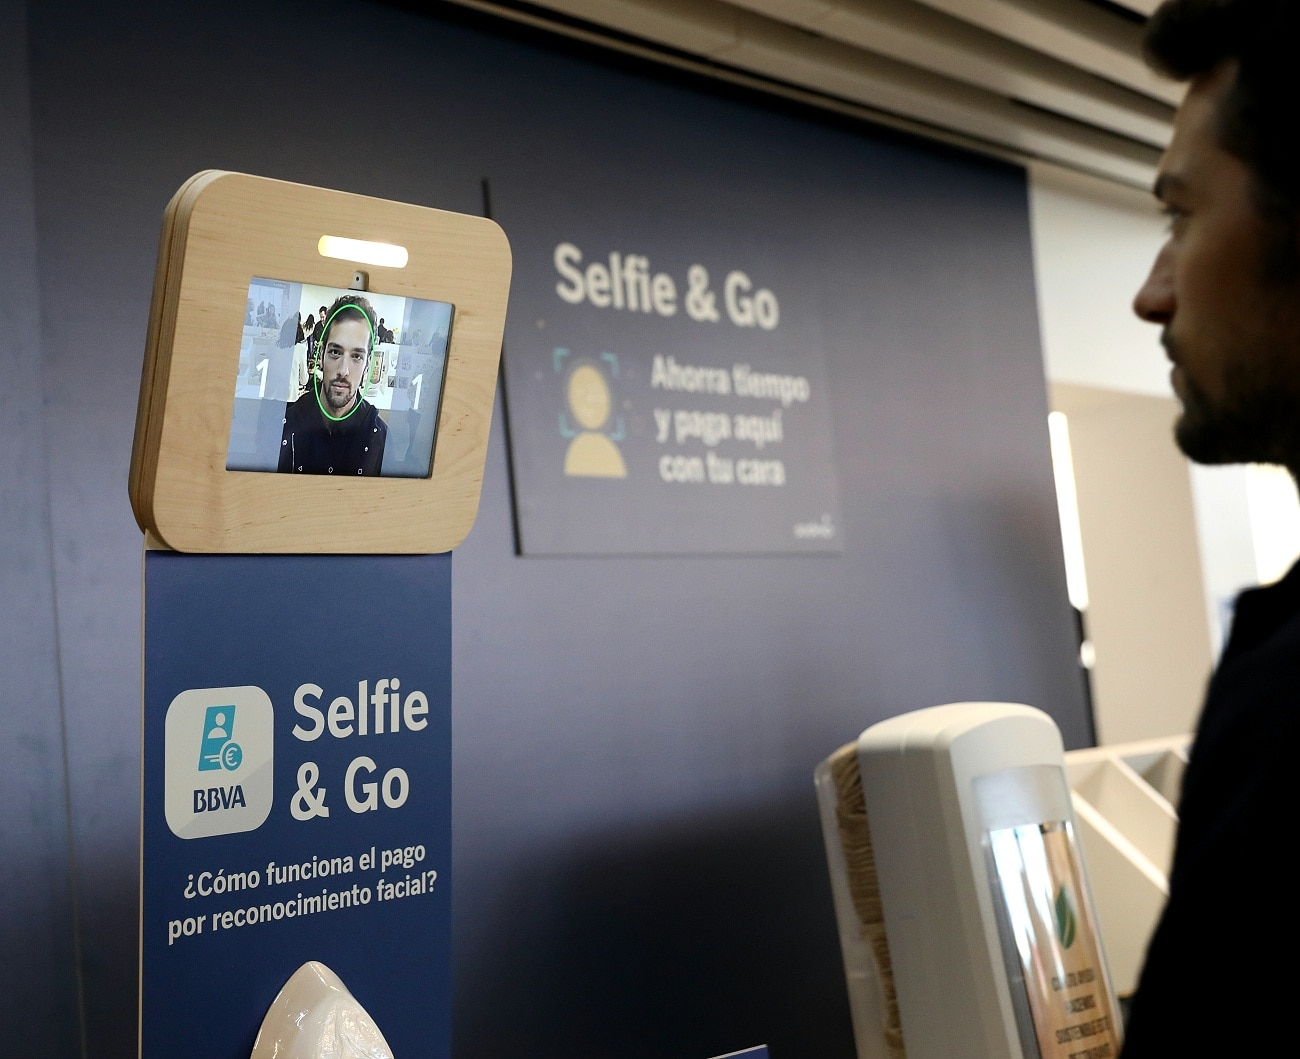 selfie-go-pablo-bbva